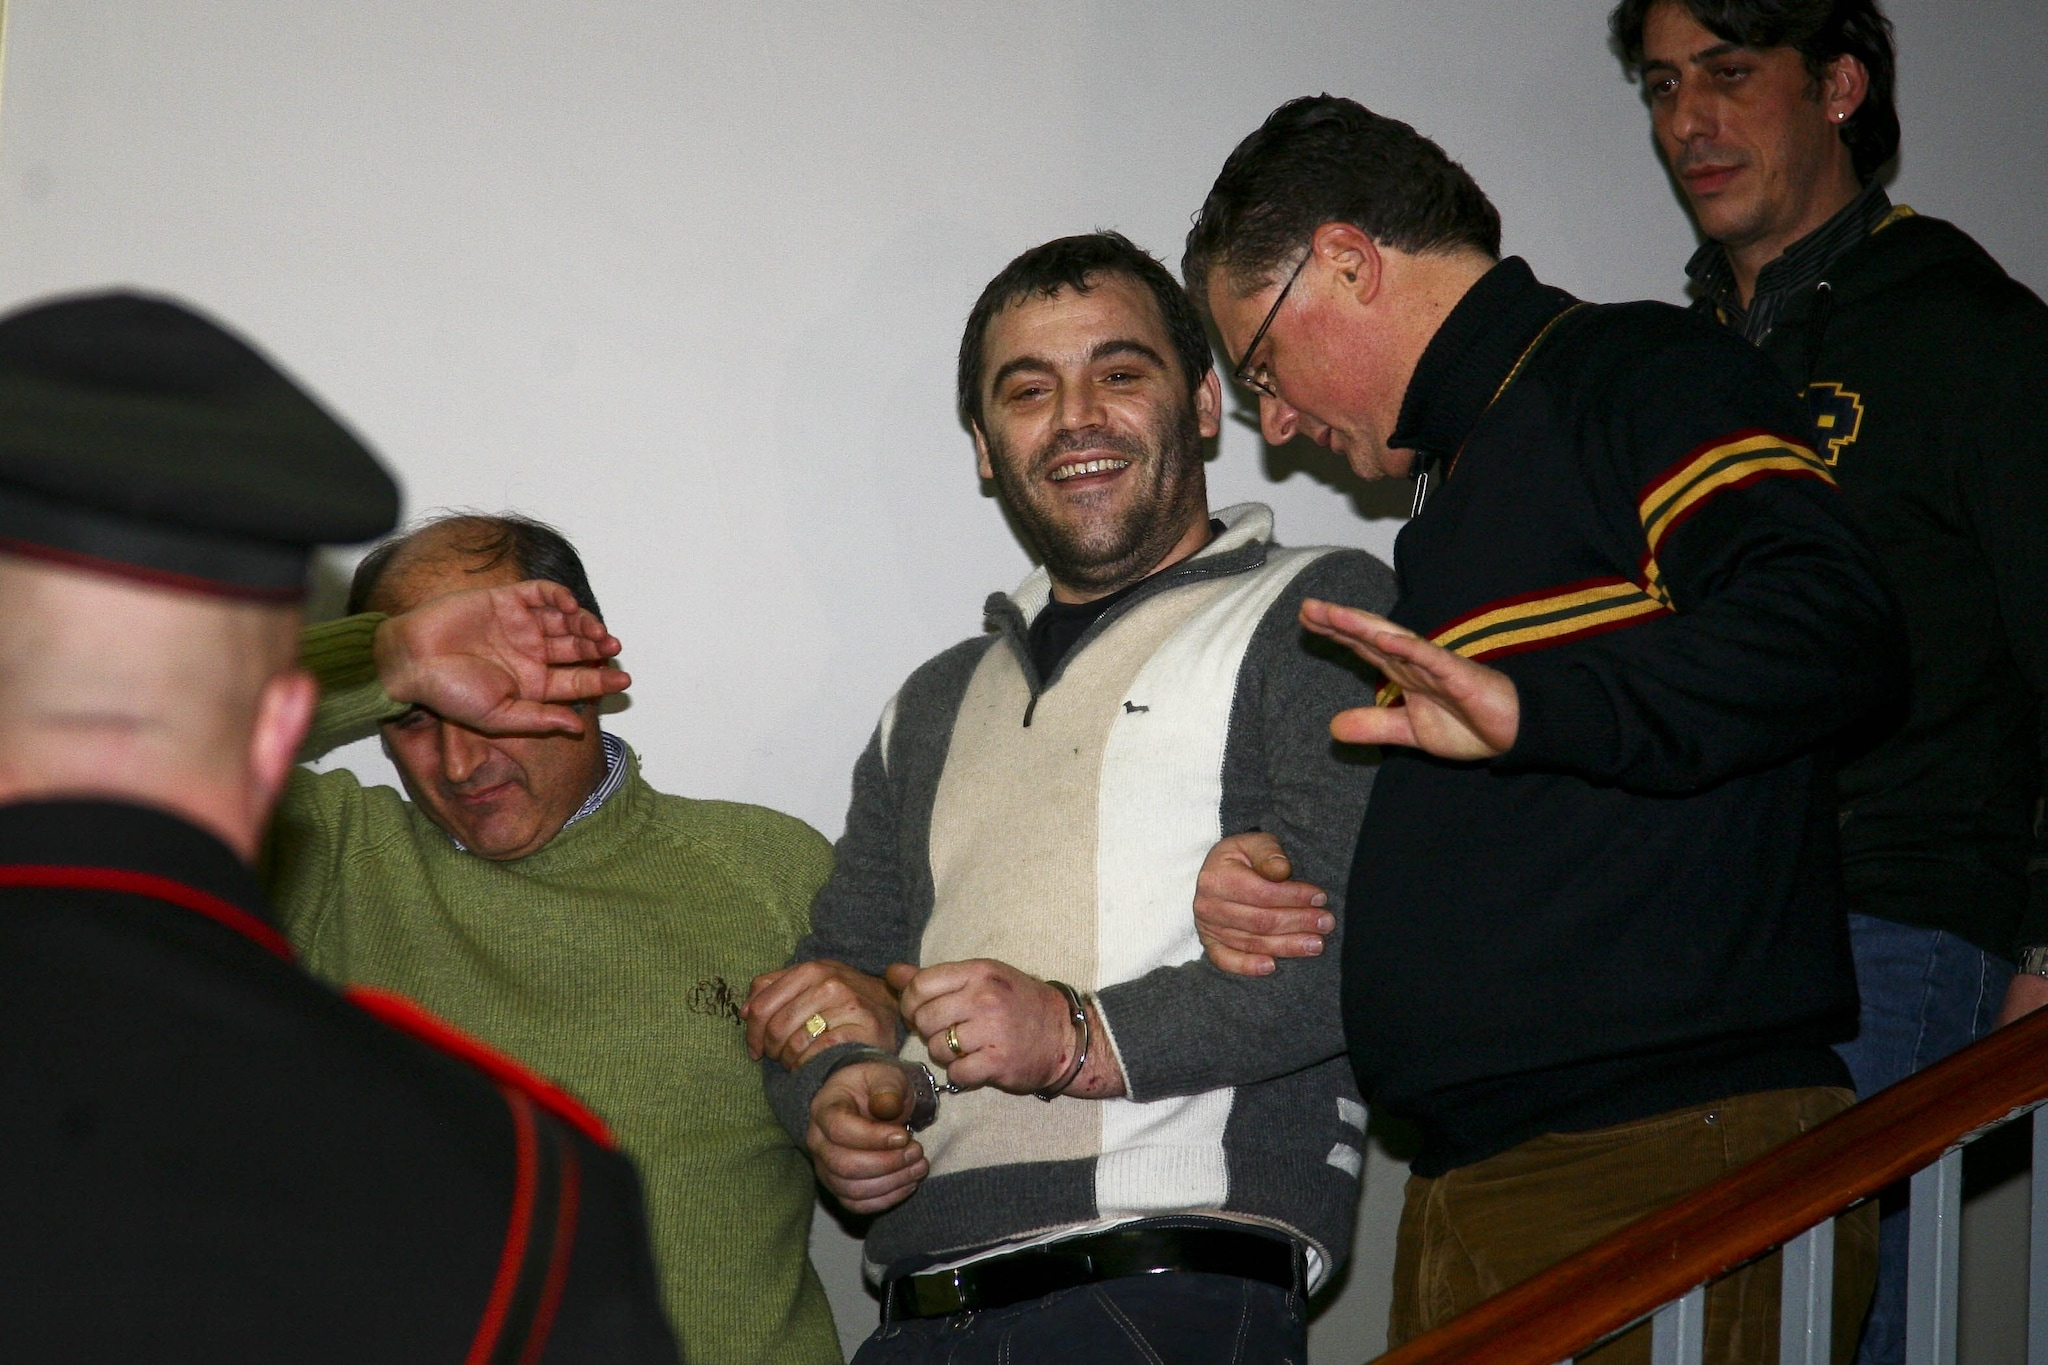 2009: l' arresto del superlatitante Giuseppe Setola